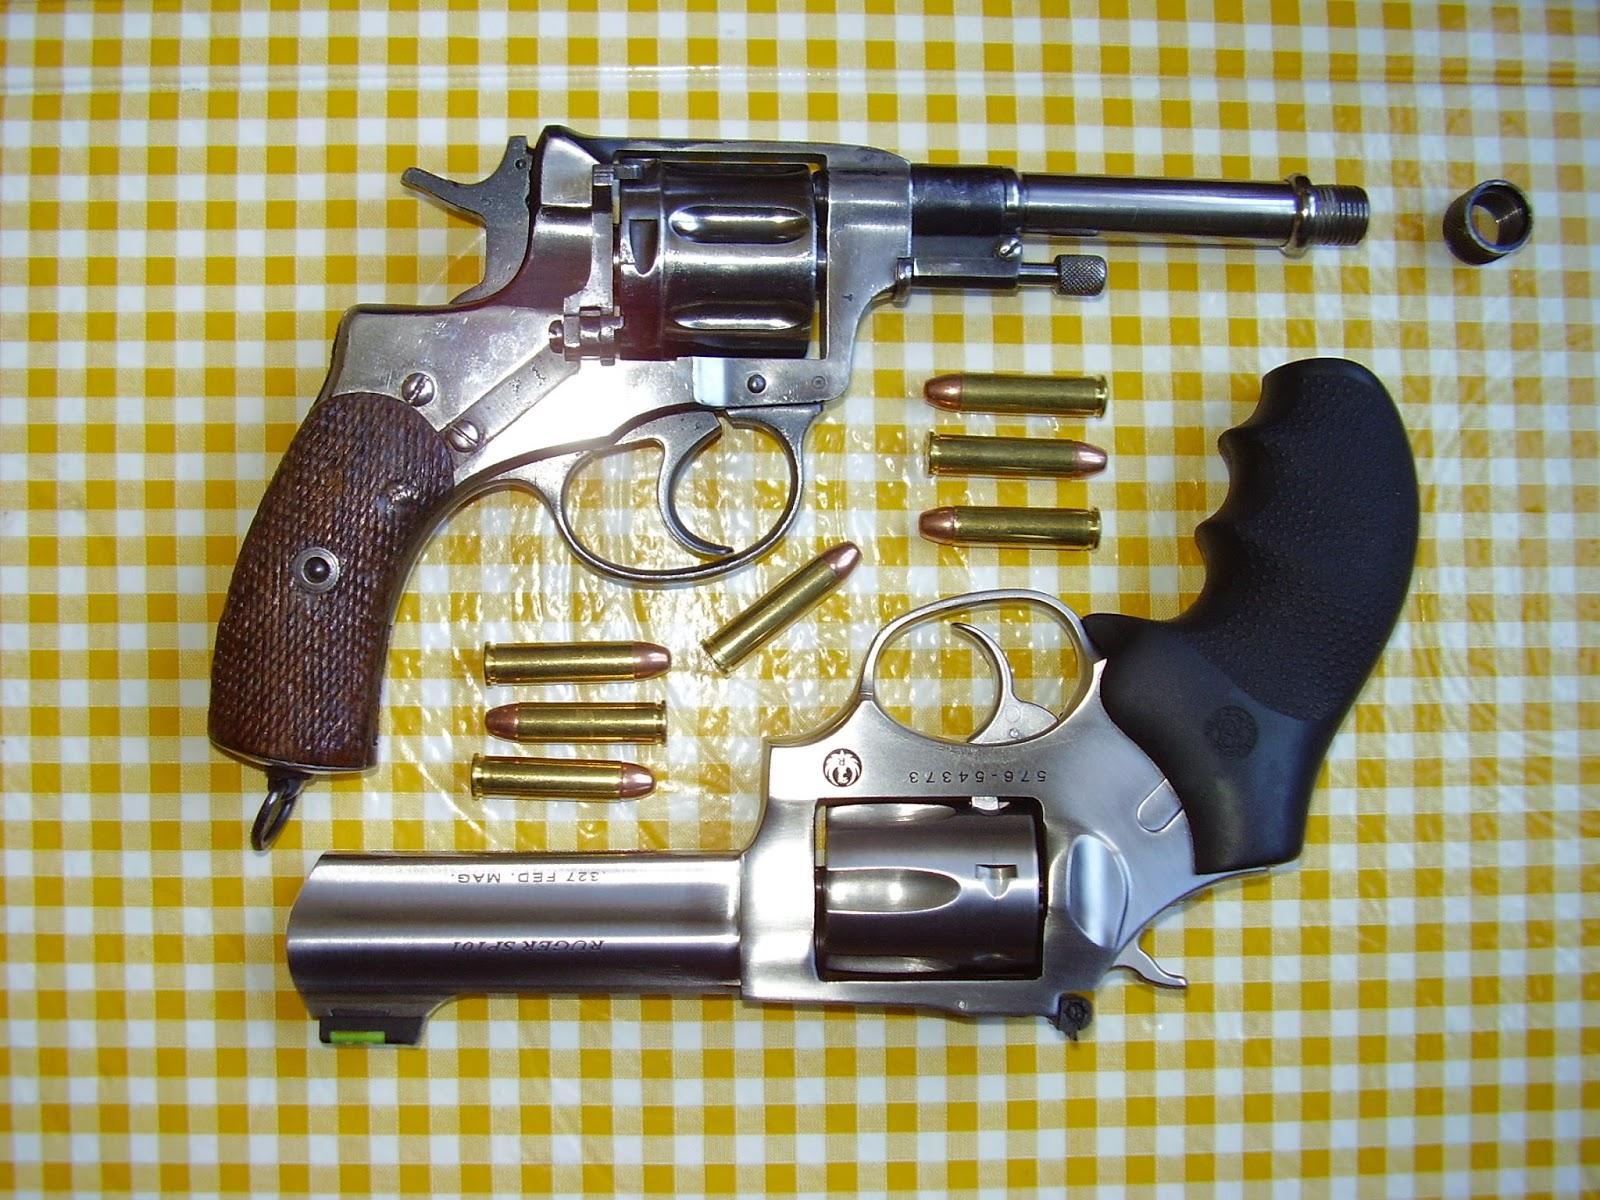 on target shooter nz: Nagant Alternative Revolver For 327